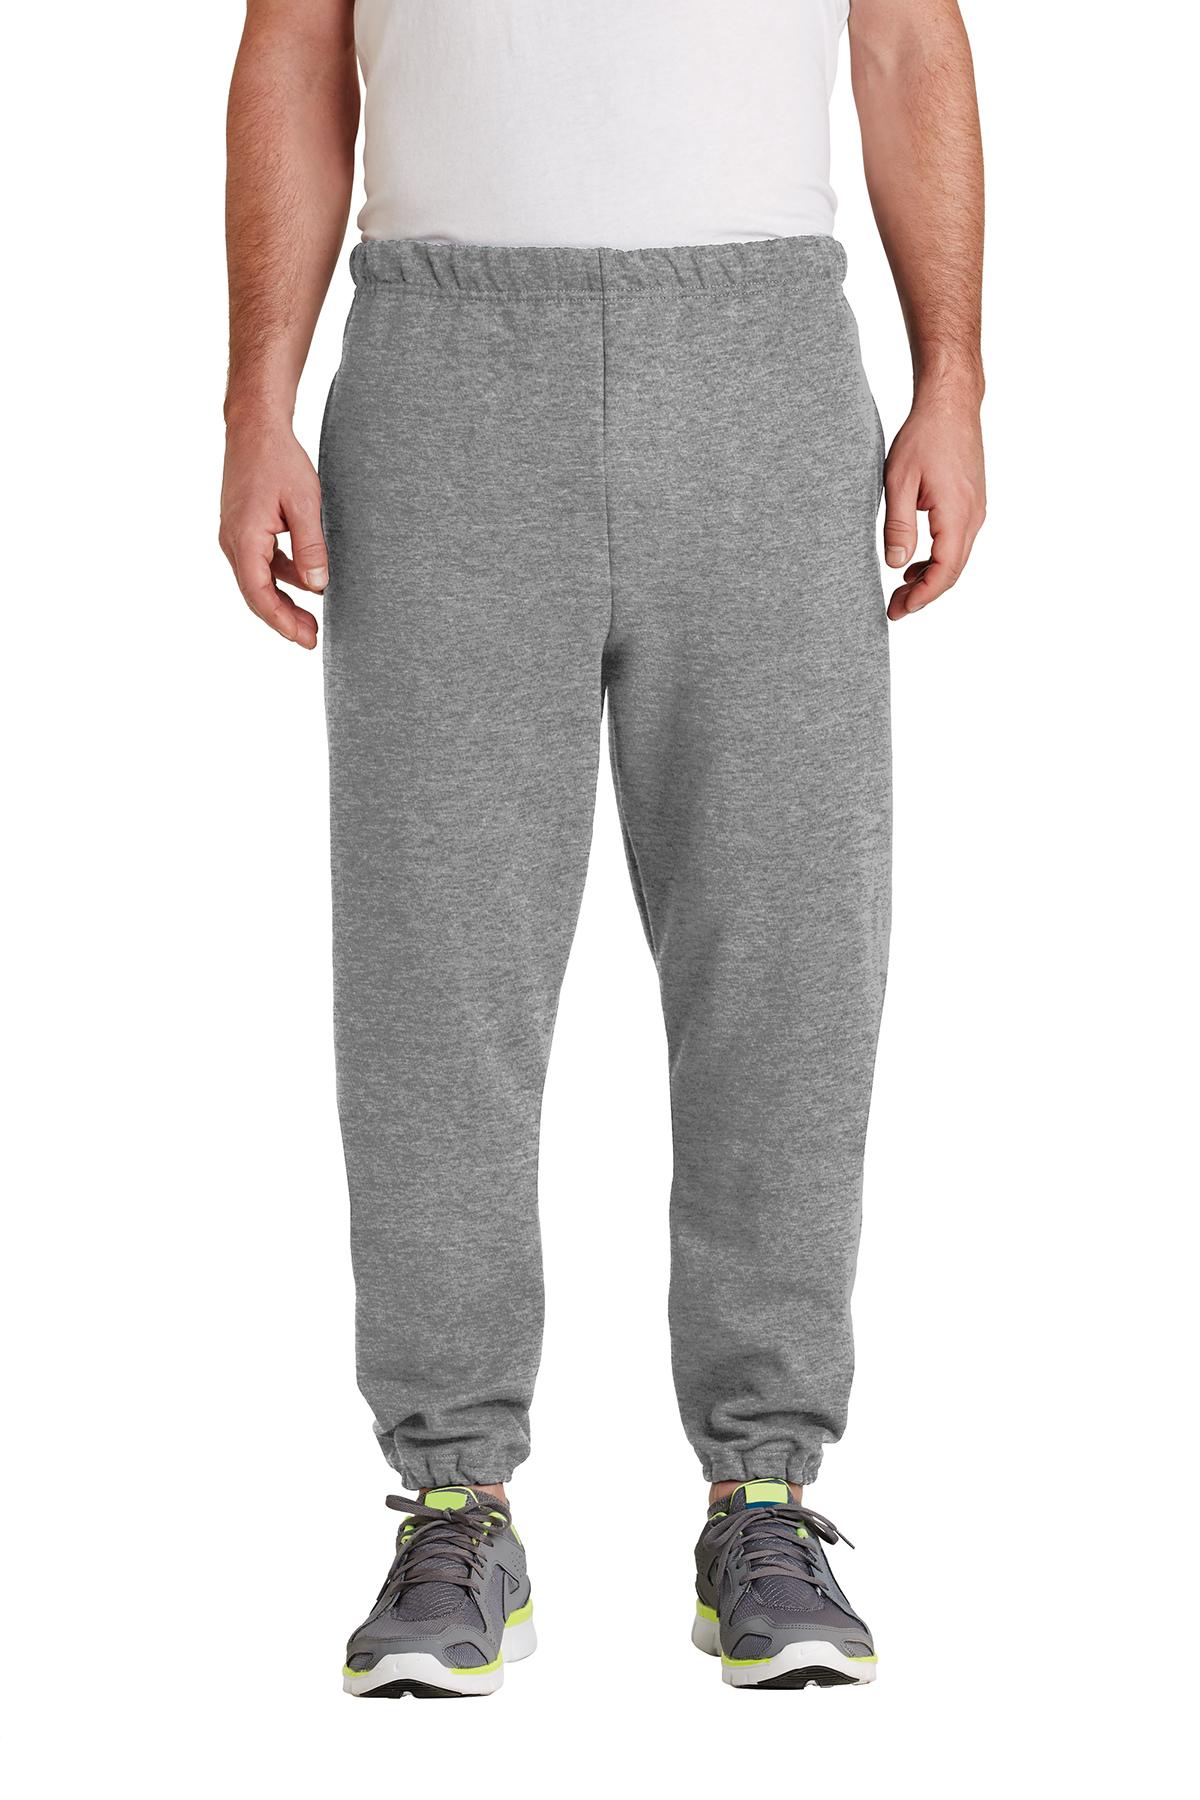 c30f3748c355ff JERZEES® SUPER SWEATS® NuBlend® - Sweatpant with Pockets ...